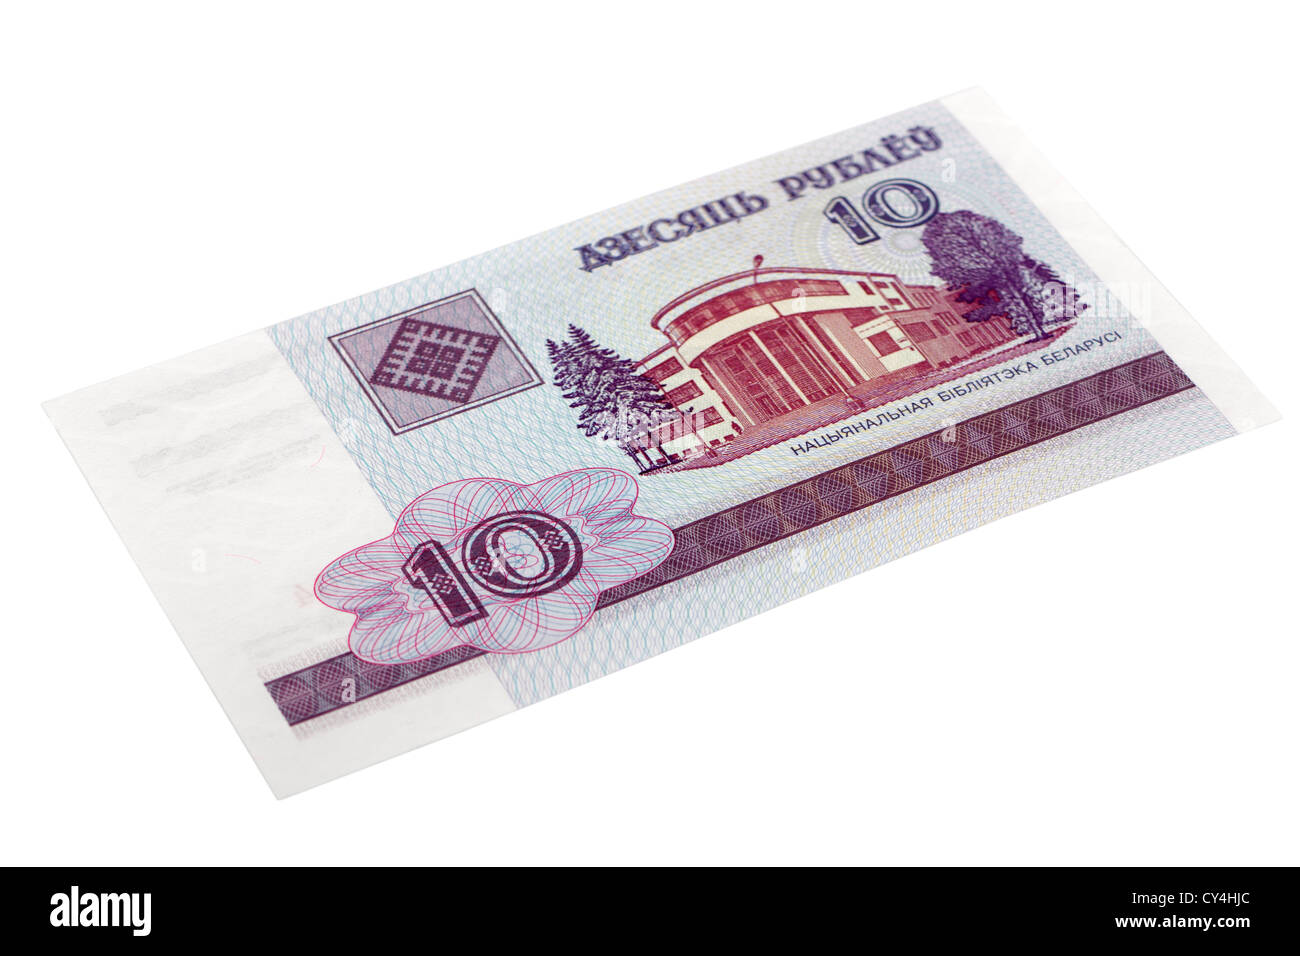 Belarus 10 Rublei 2000 P.23 - Stock Image